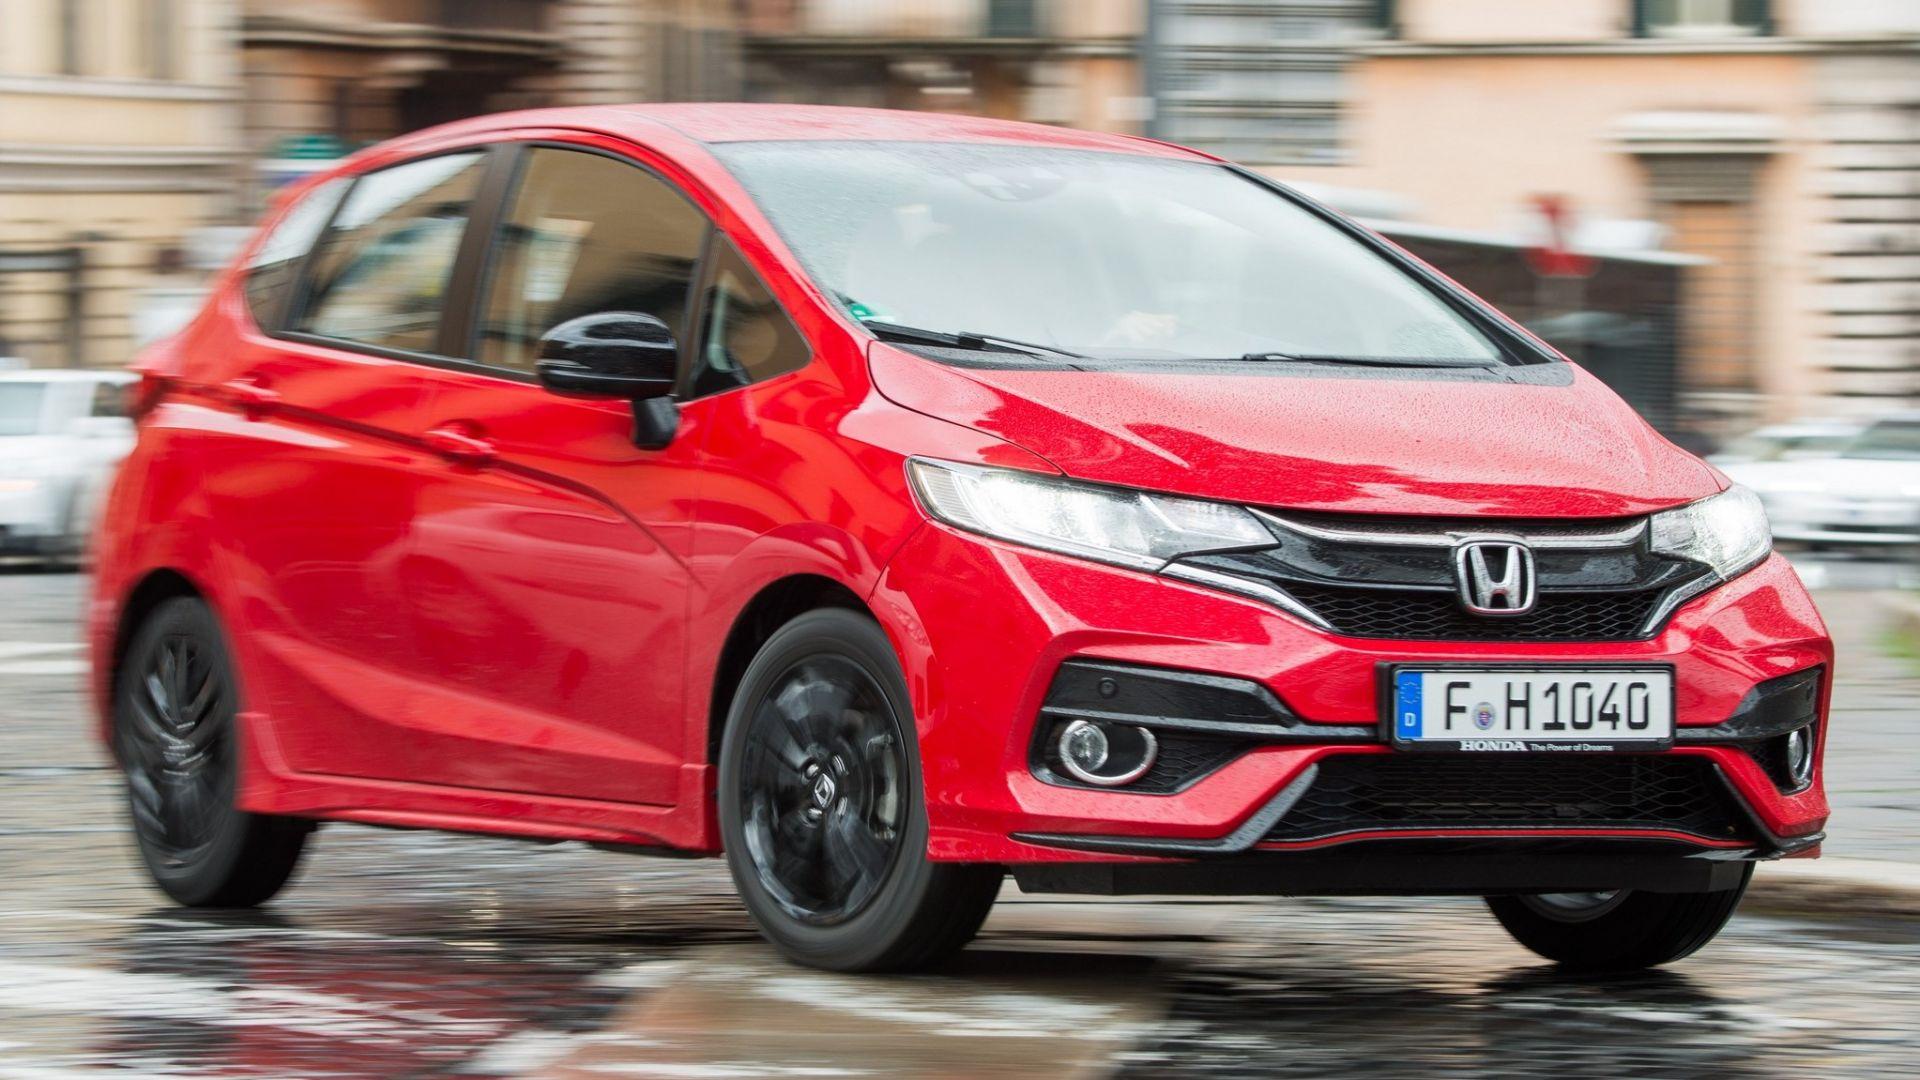 Nuova Honda Jazz 2018 Prova Restyling Interni Bagagliaio Prezzi